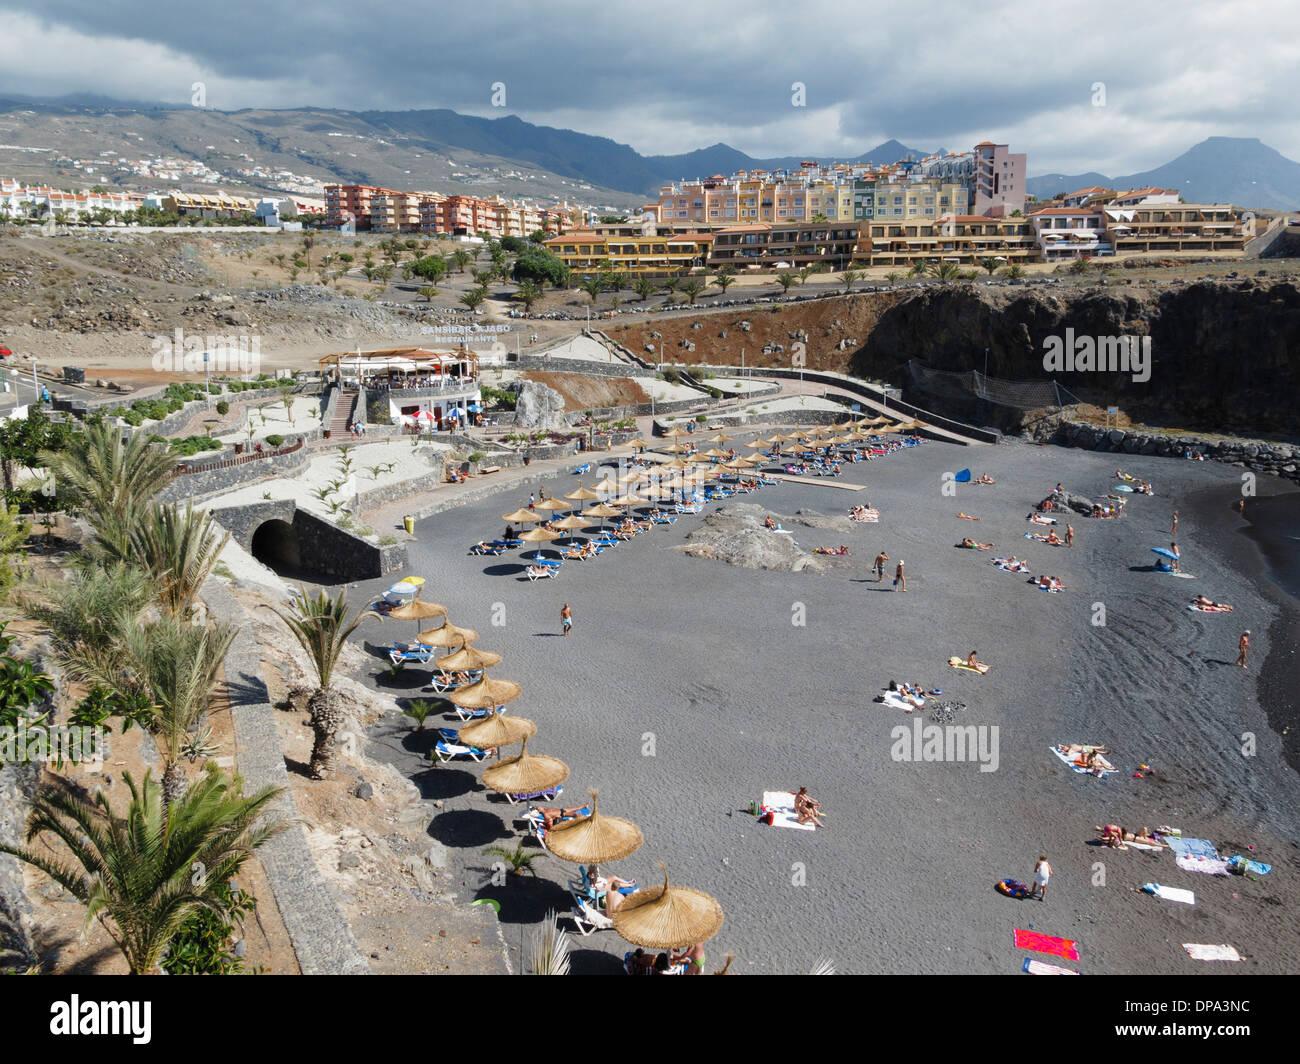 Tenerife Canary Islands Montecatini Terme photos